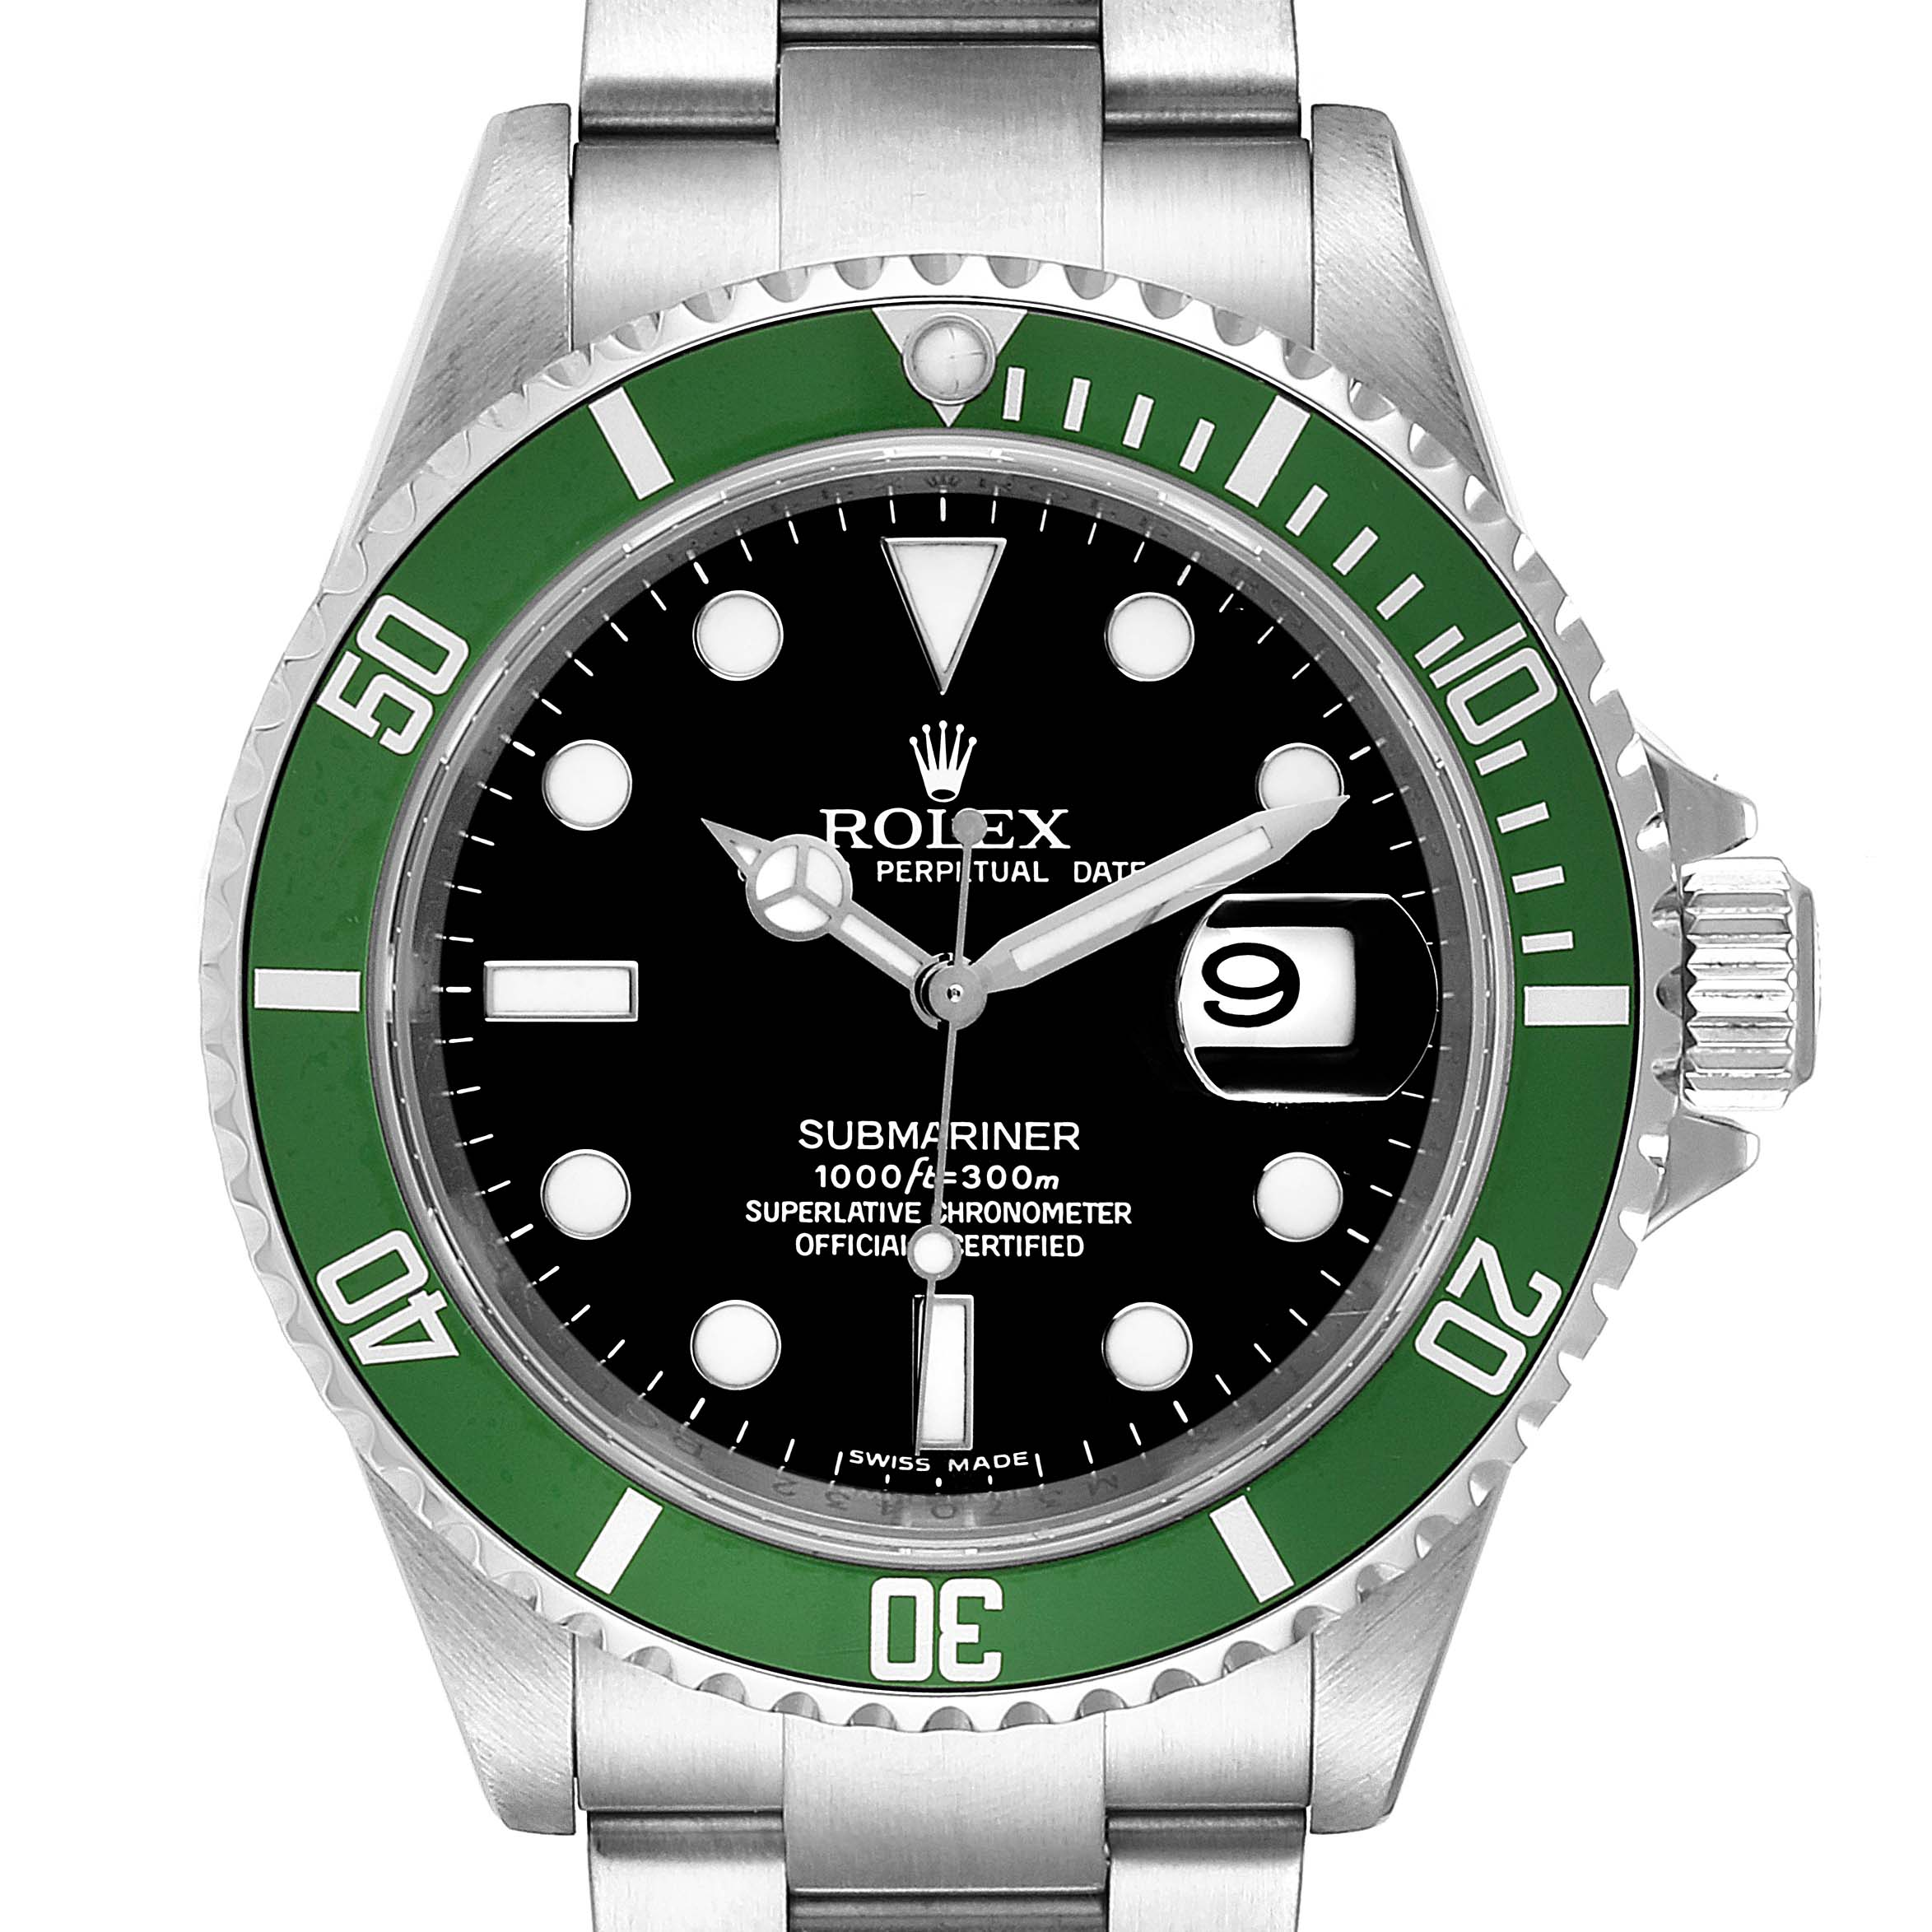 Rolex Submariner 50th Anniversary Green Kermit Watch 16610LV Box Card